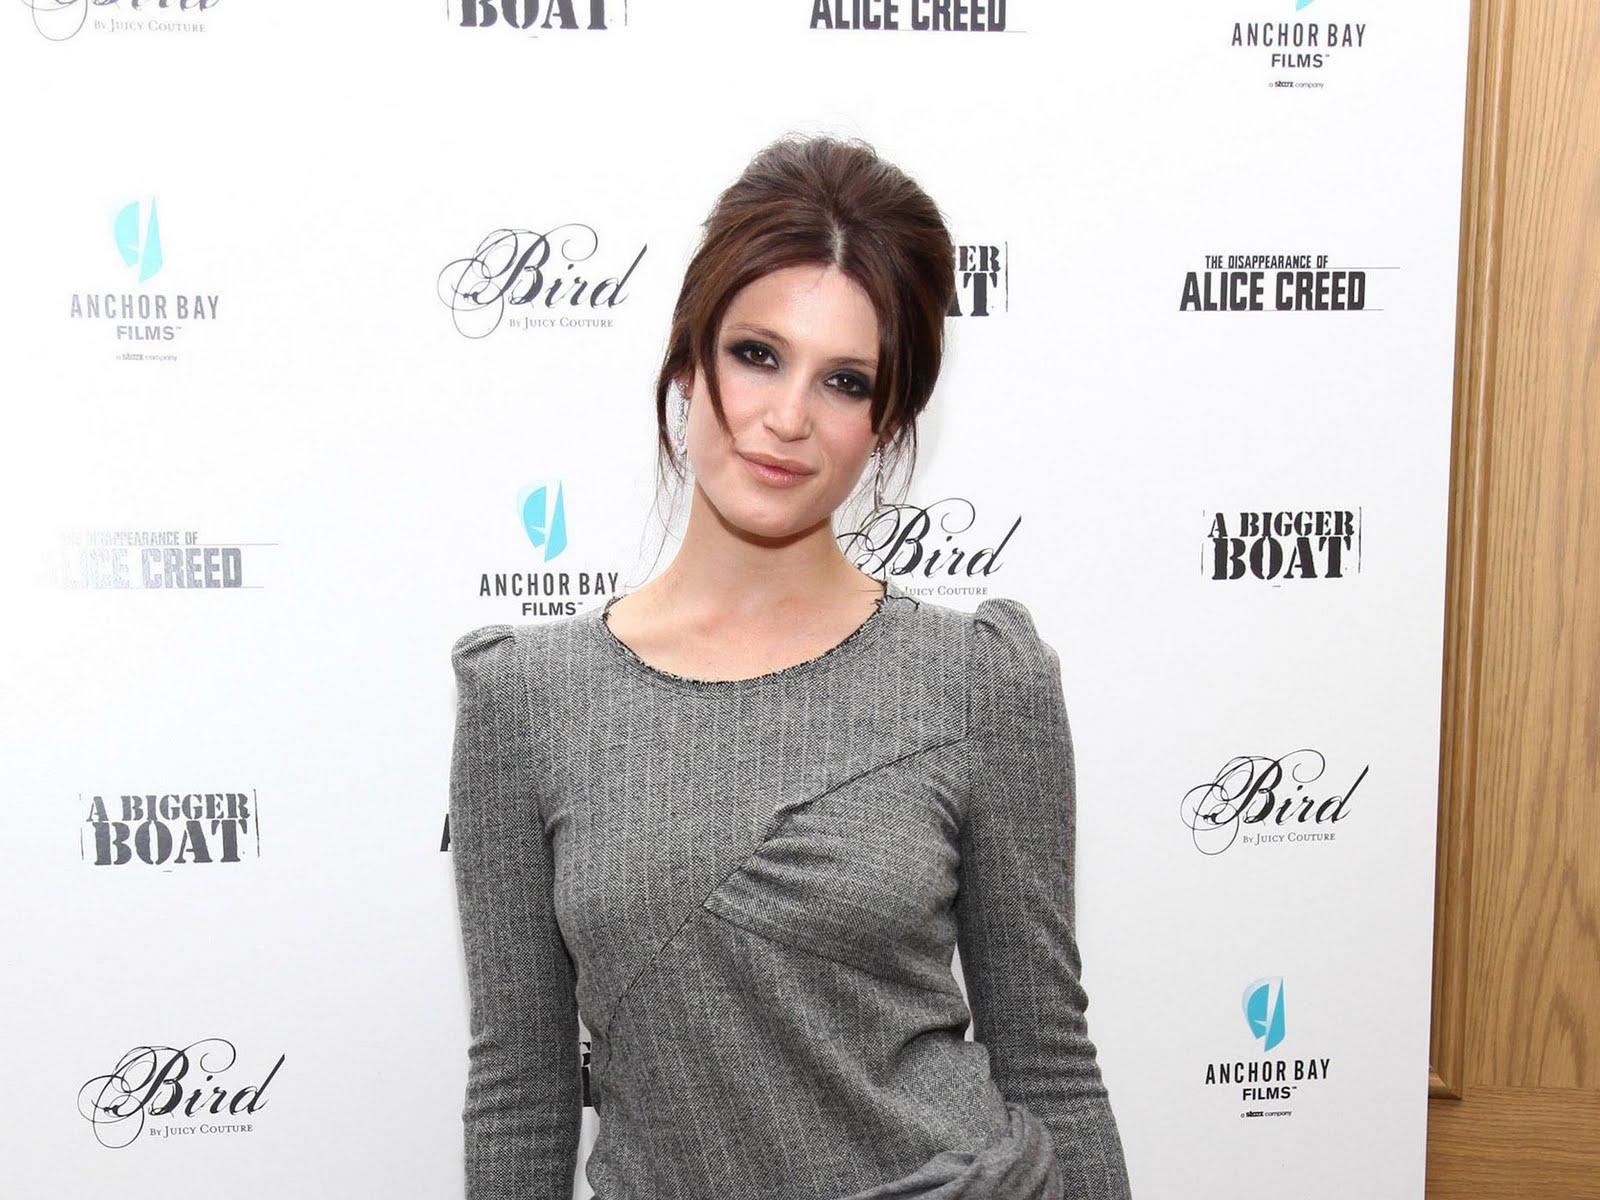 http://3.bp.blogspot.com/_BpAoKRSdVjQ/TVDQjZ3DLjI/AAAAAAAAEbw/0u6yrxlziok/s1600/Gemma-Arterton-hot-actress.jpg